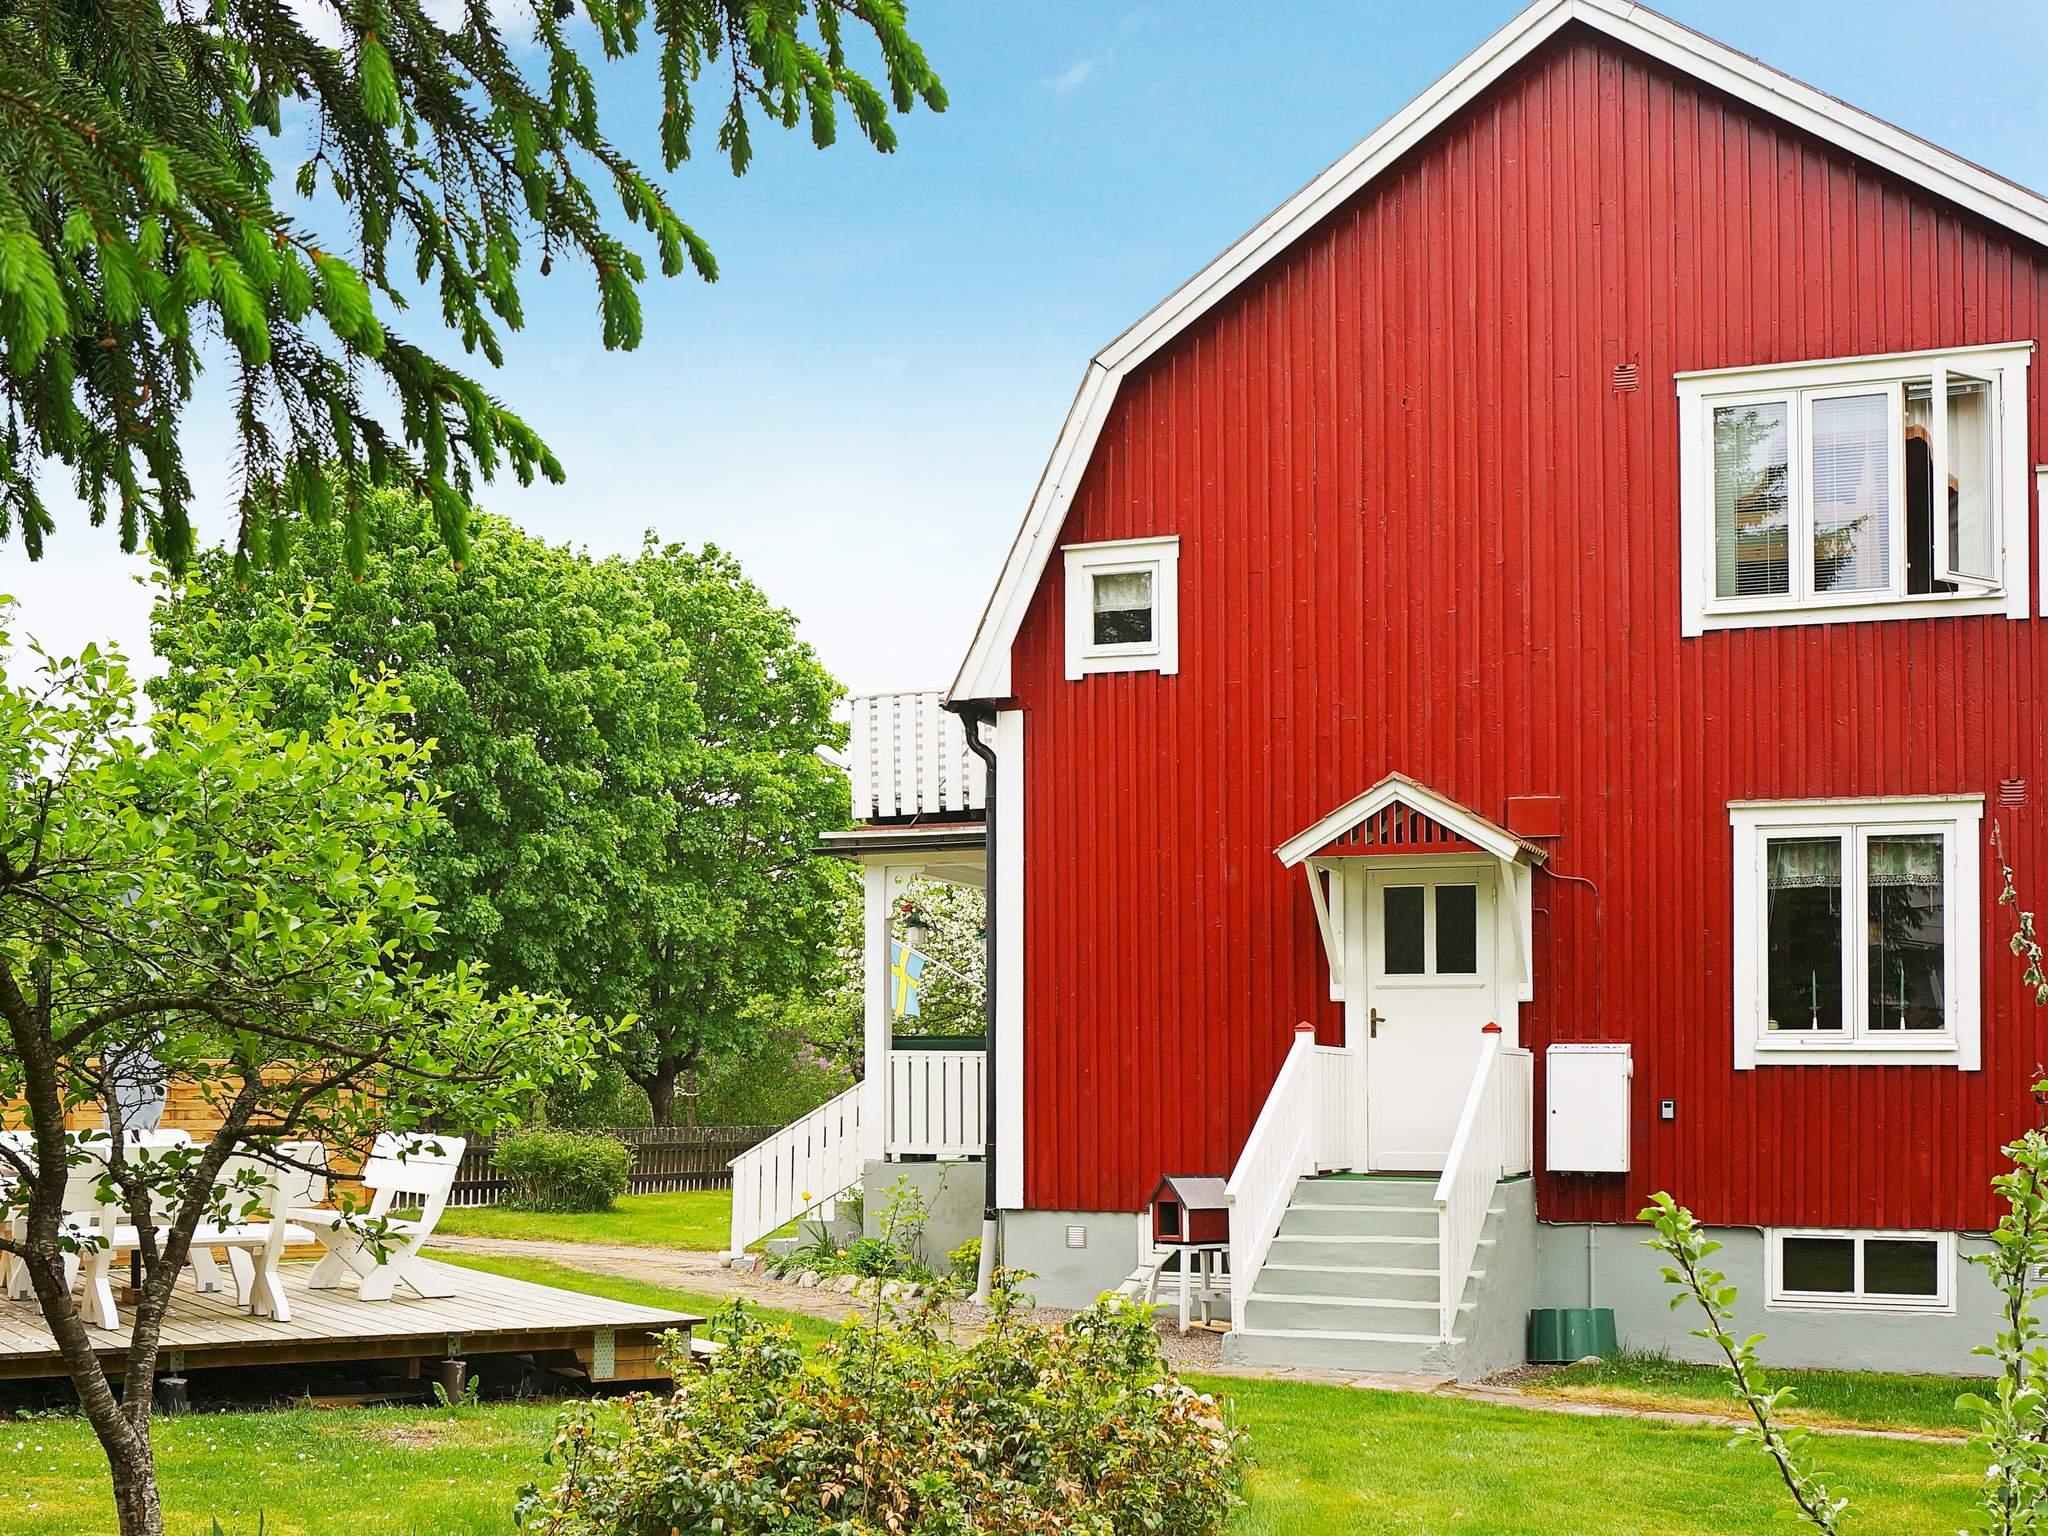 Ferienhaus Sandsjöfors (418764), Sandsjöfors, Jönköpings län, Südschweden, Schweden, Bild 20